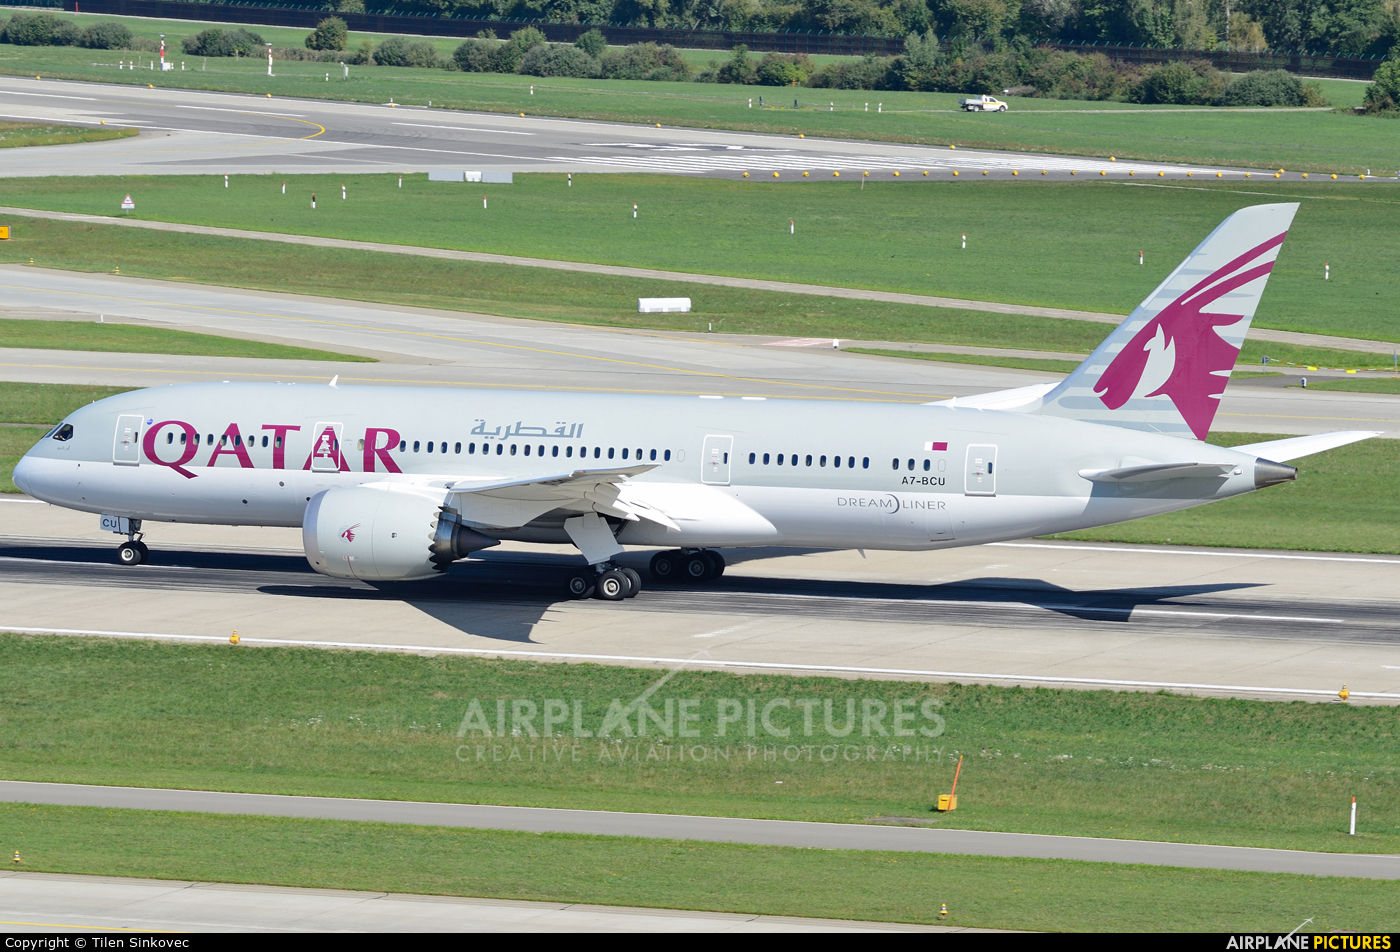 Qatar Airways A7-BCU aircraft at Zurich